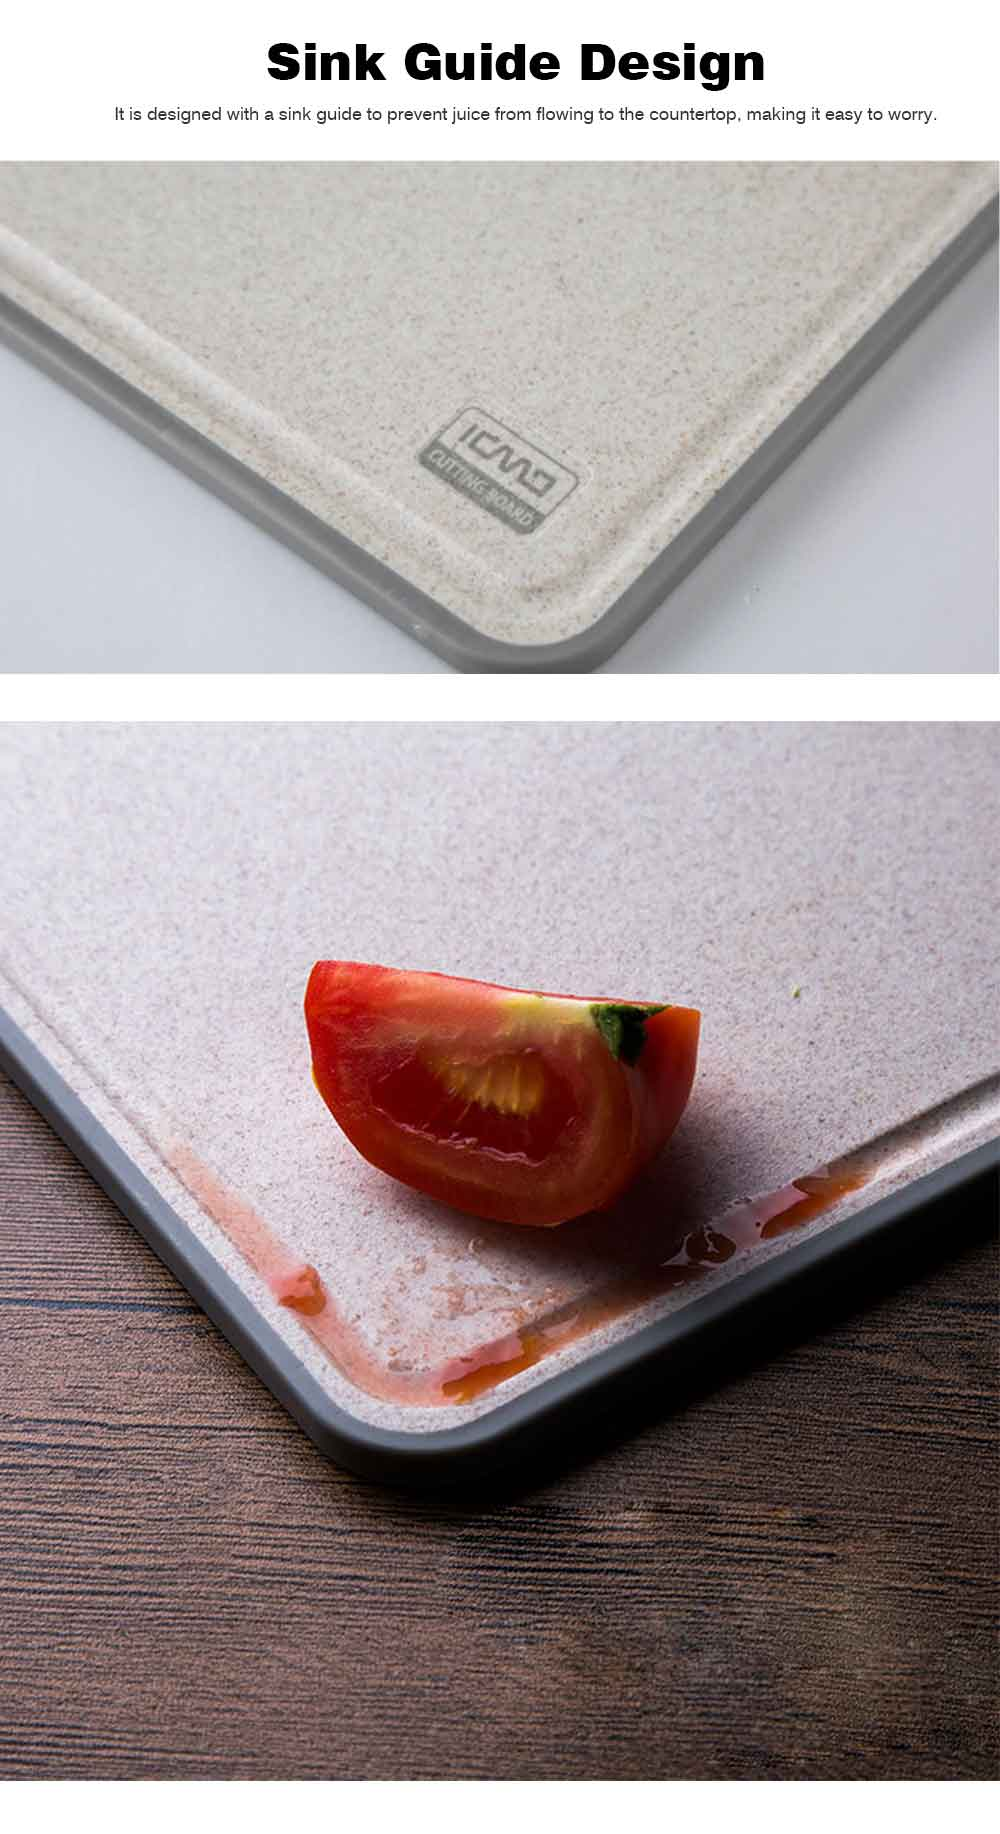 Curved Grain Fiber Chopping Board, Non-slip Cutting Board with L-shaped Handle Design 4